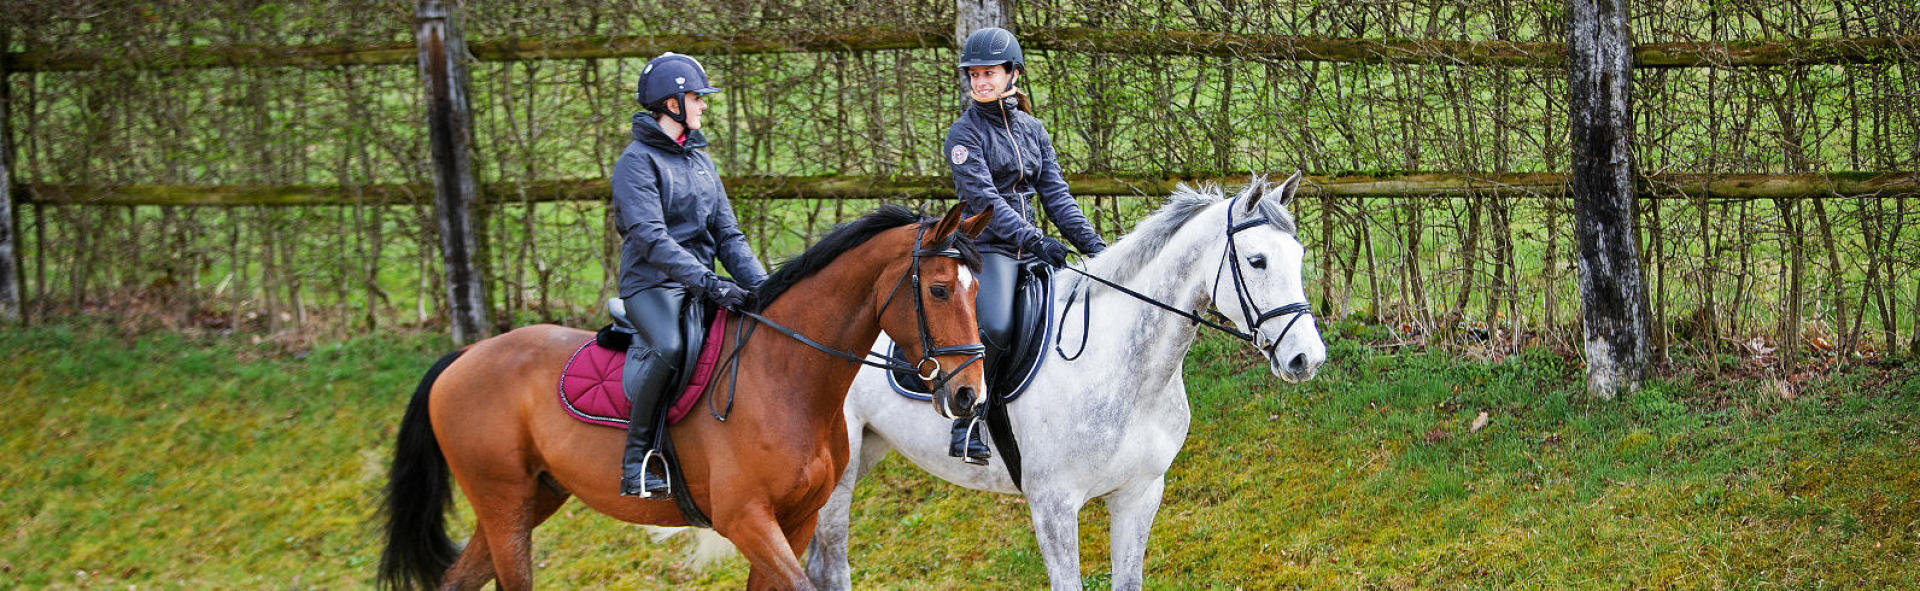 equitation hiver